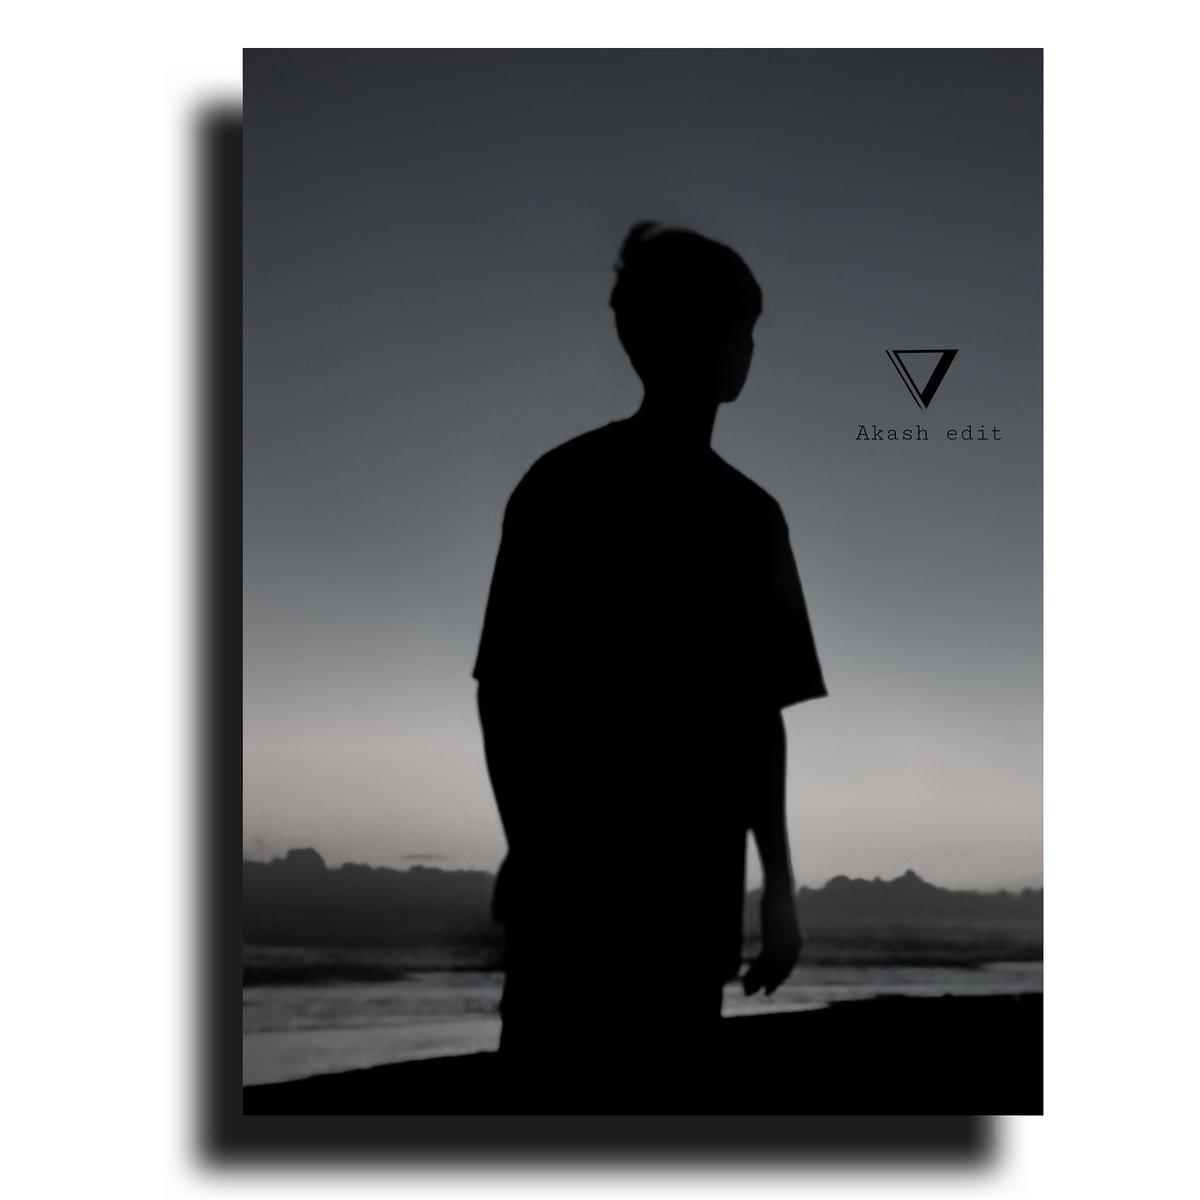 #Newsnight #ROCKY #MoonLovers #photography #blackandwhite #blackish #shadows #RohitSharma #modal #ViratKohli #mrfaisu #TeamIndia #SalmanKhan #SushantSinghRajput #FullMoon #topmodel #famous #edits #canonphotography #NewPost #pose #COVID19 #Colors #SaveTheArts #LoveIsSweet https://t.co/VLTHANcBY4